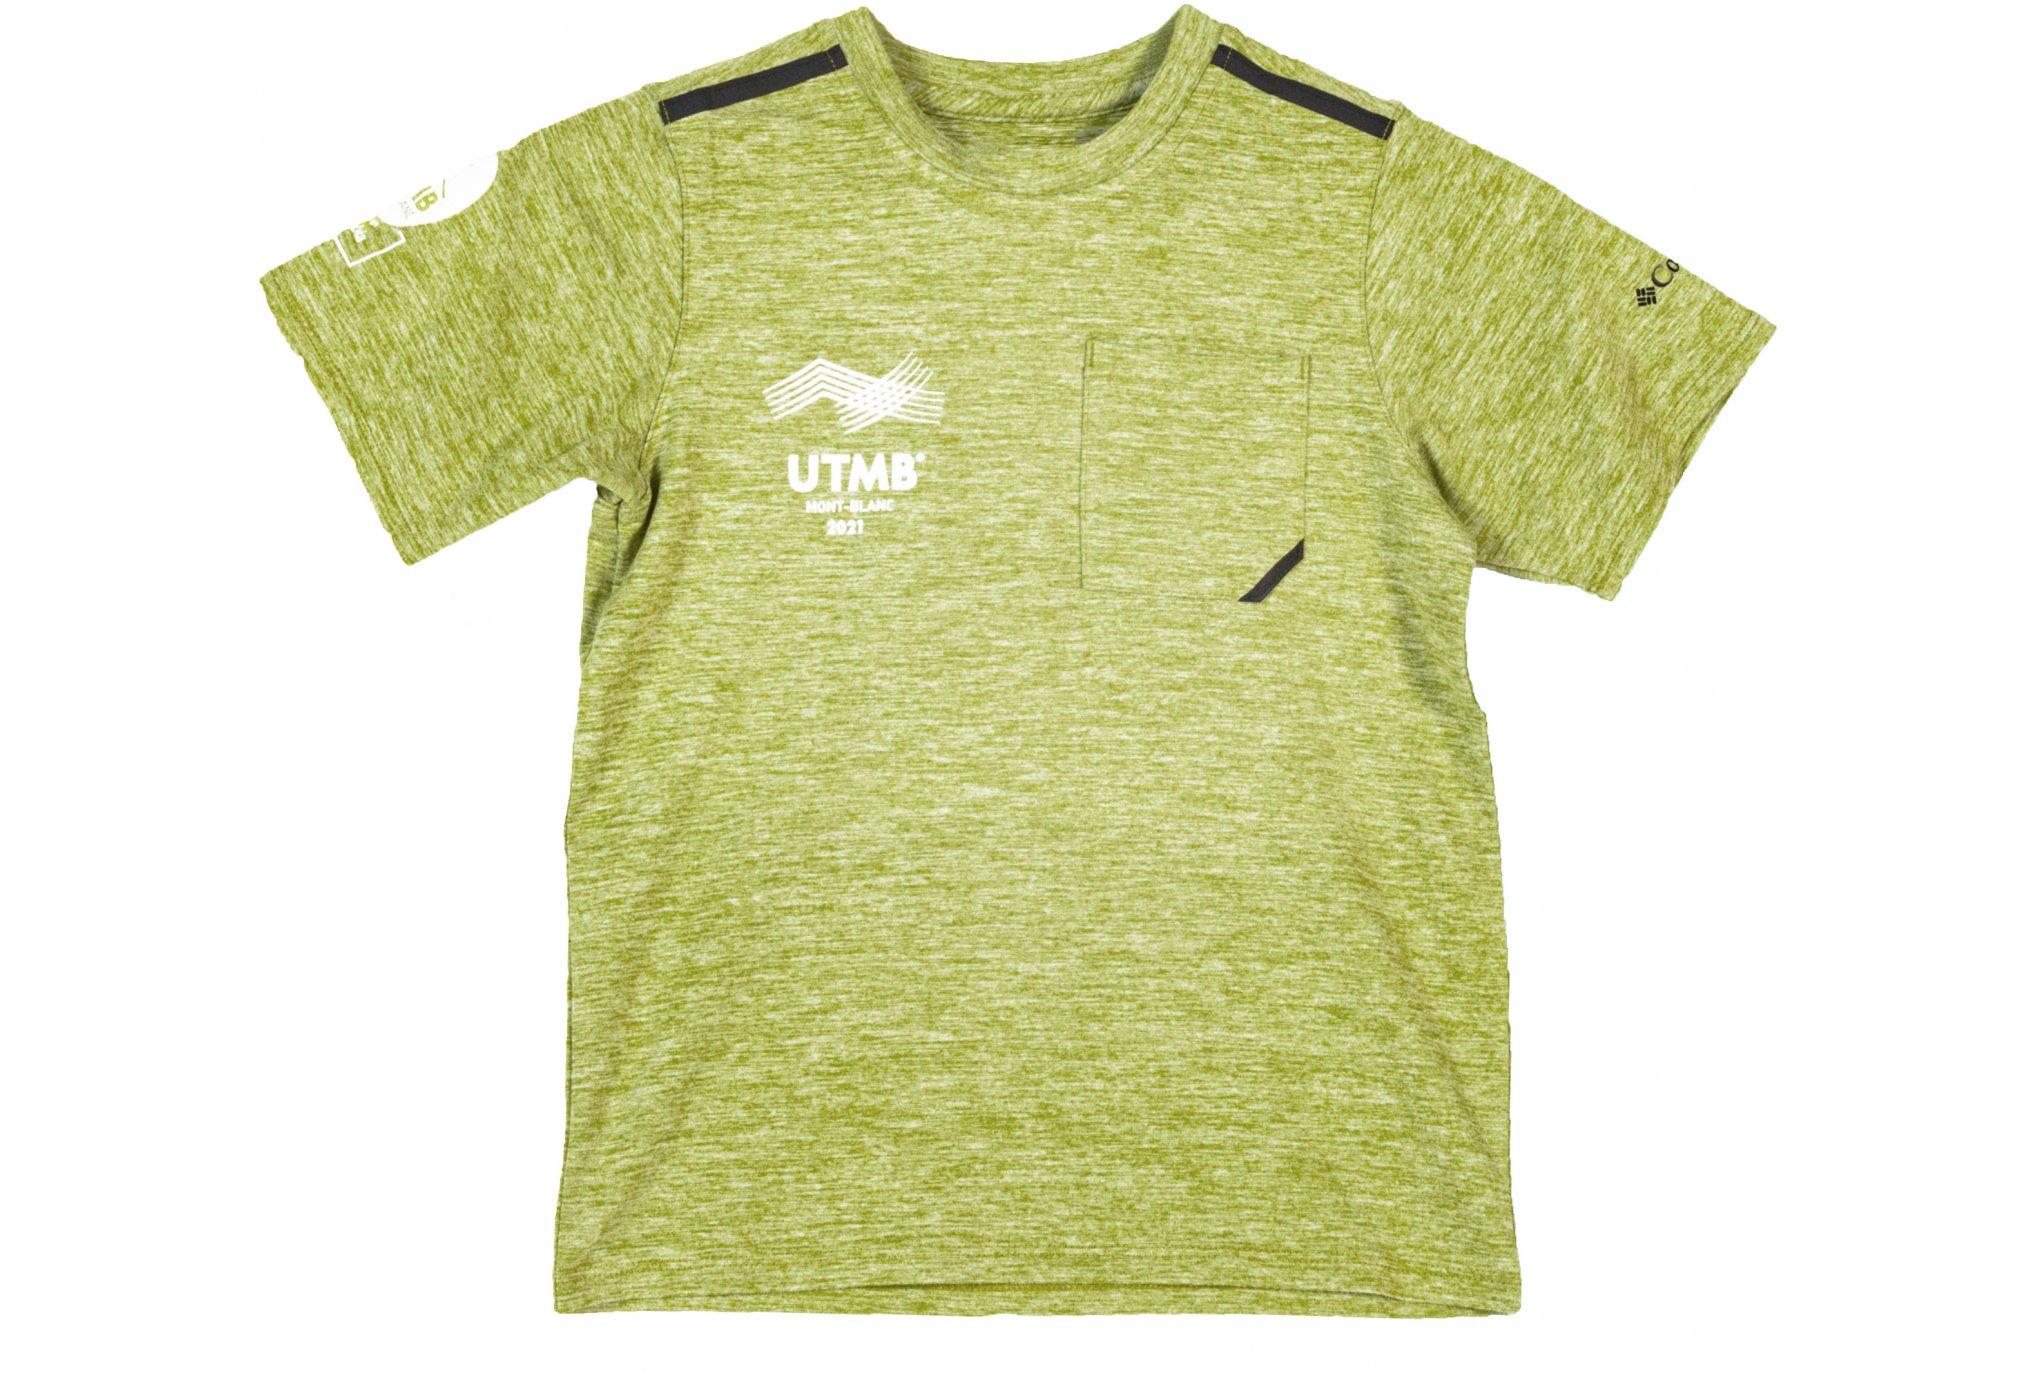 Columbia Tech Trek UTMB 2021 Junior vêtement running homme